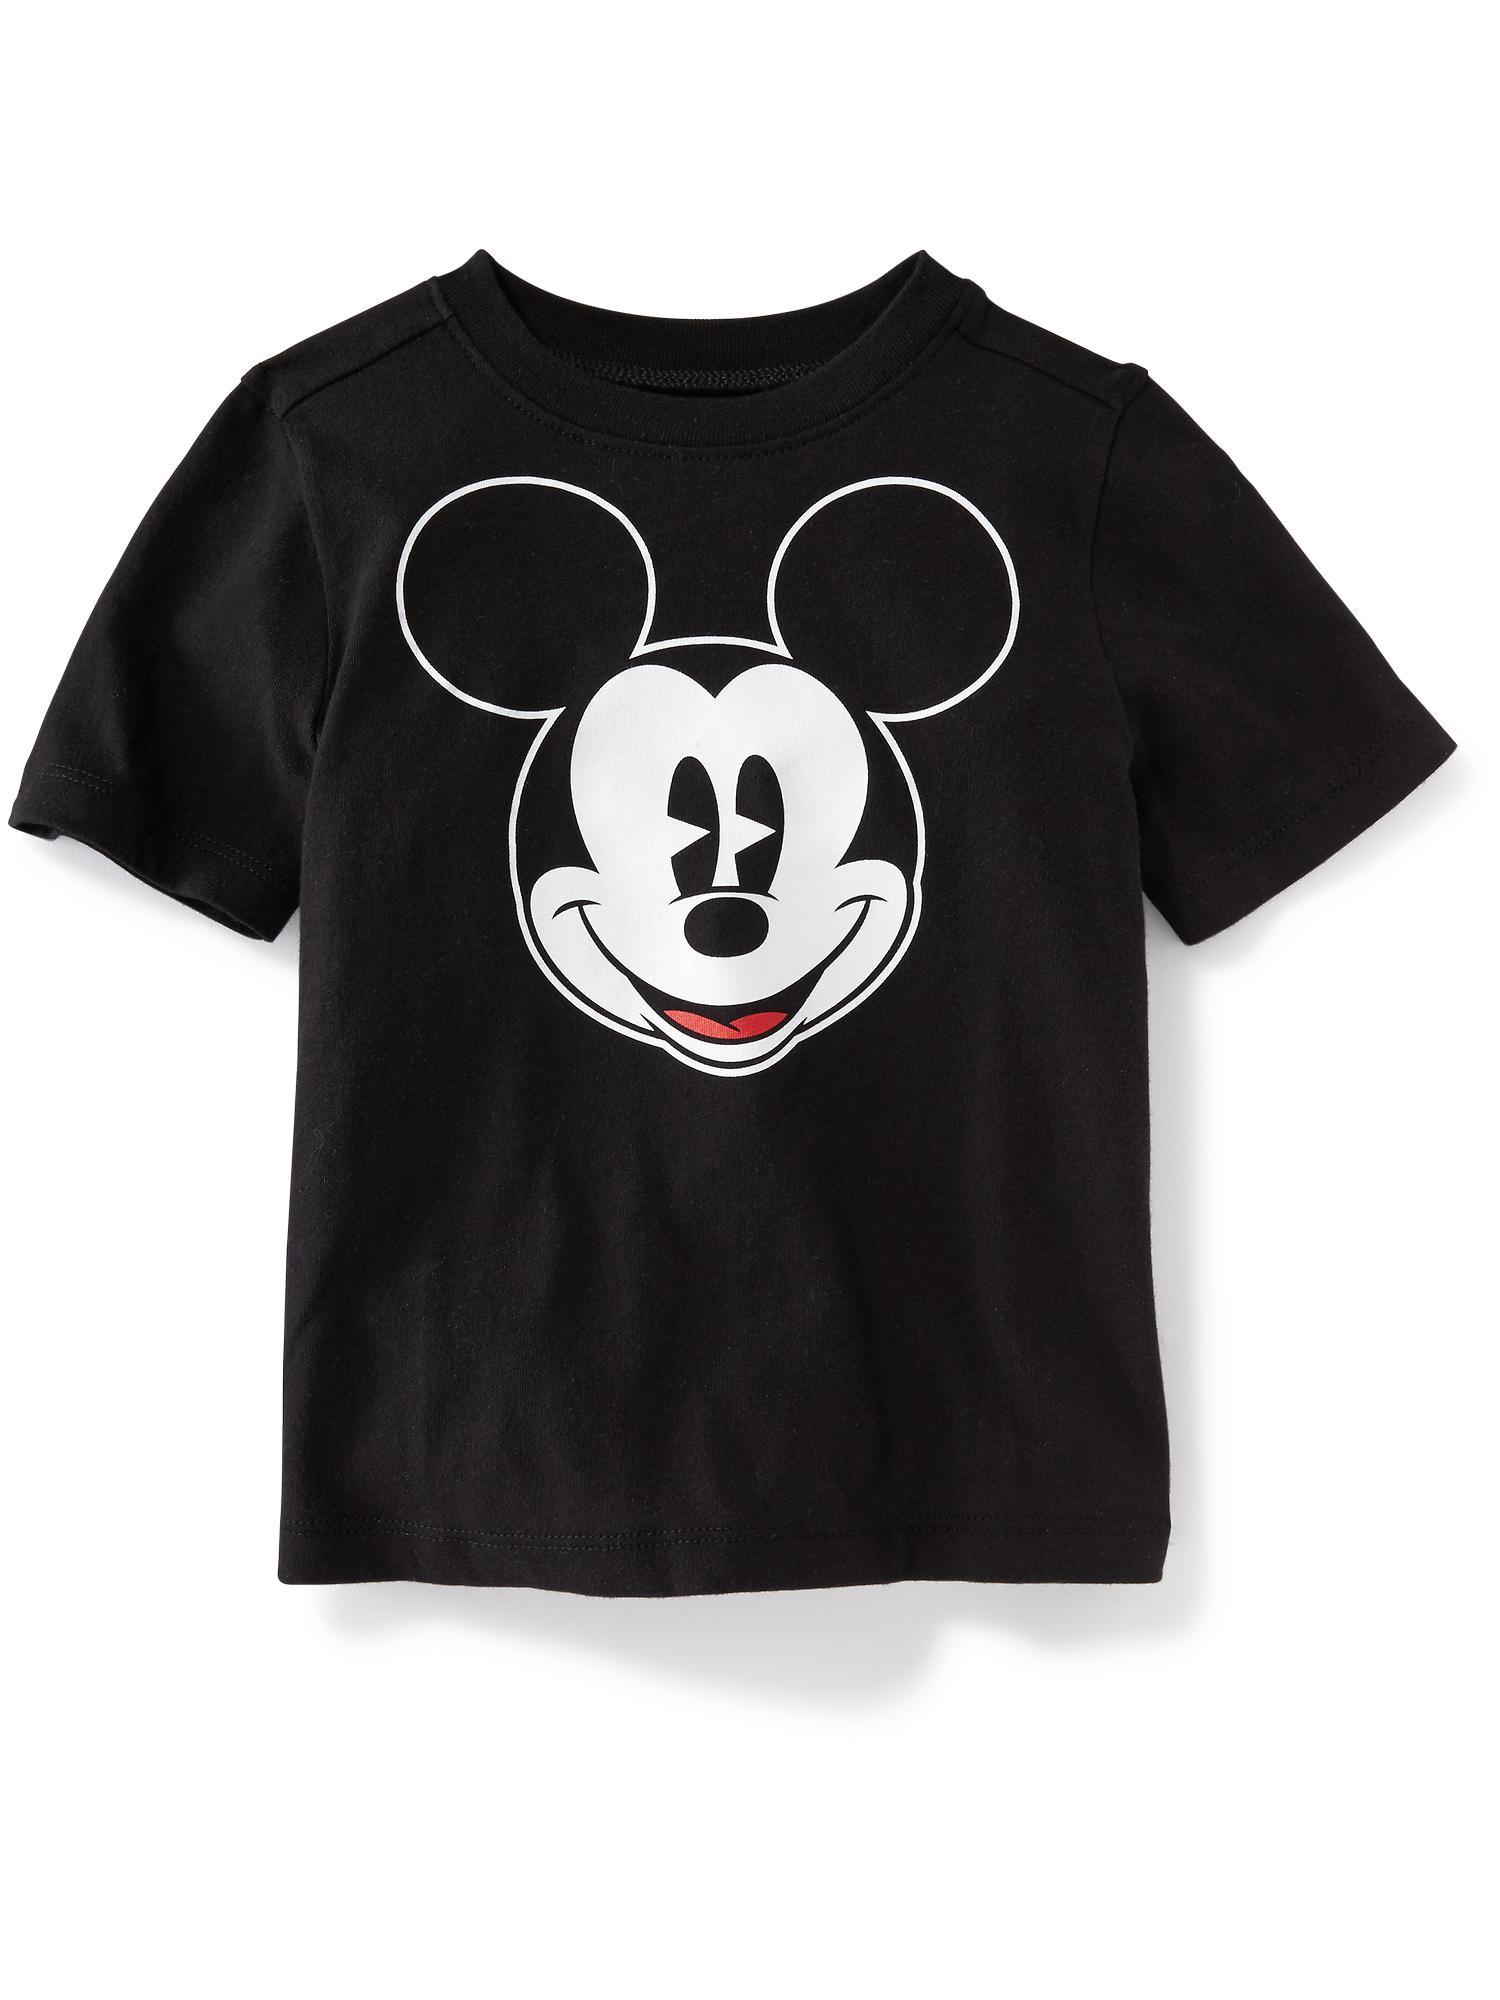 Neuf Avec étiquettes Disney Store Parks Mickey Mouse tee shirt garçon XS L XL